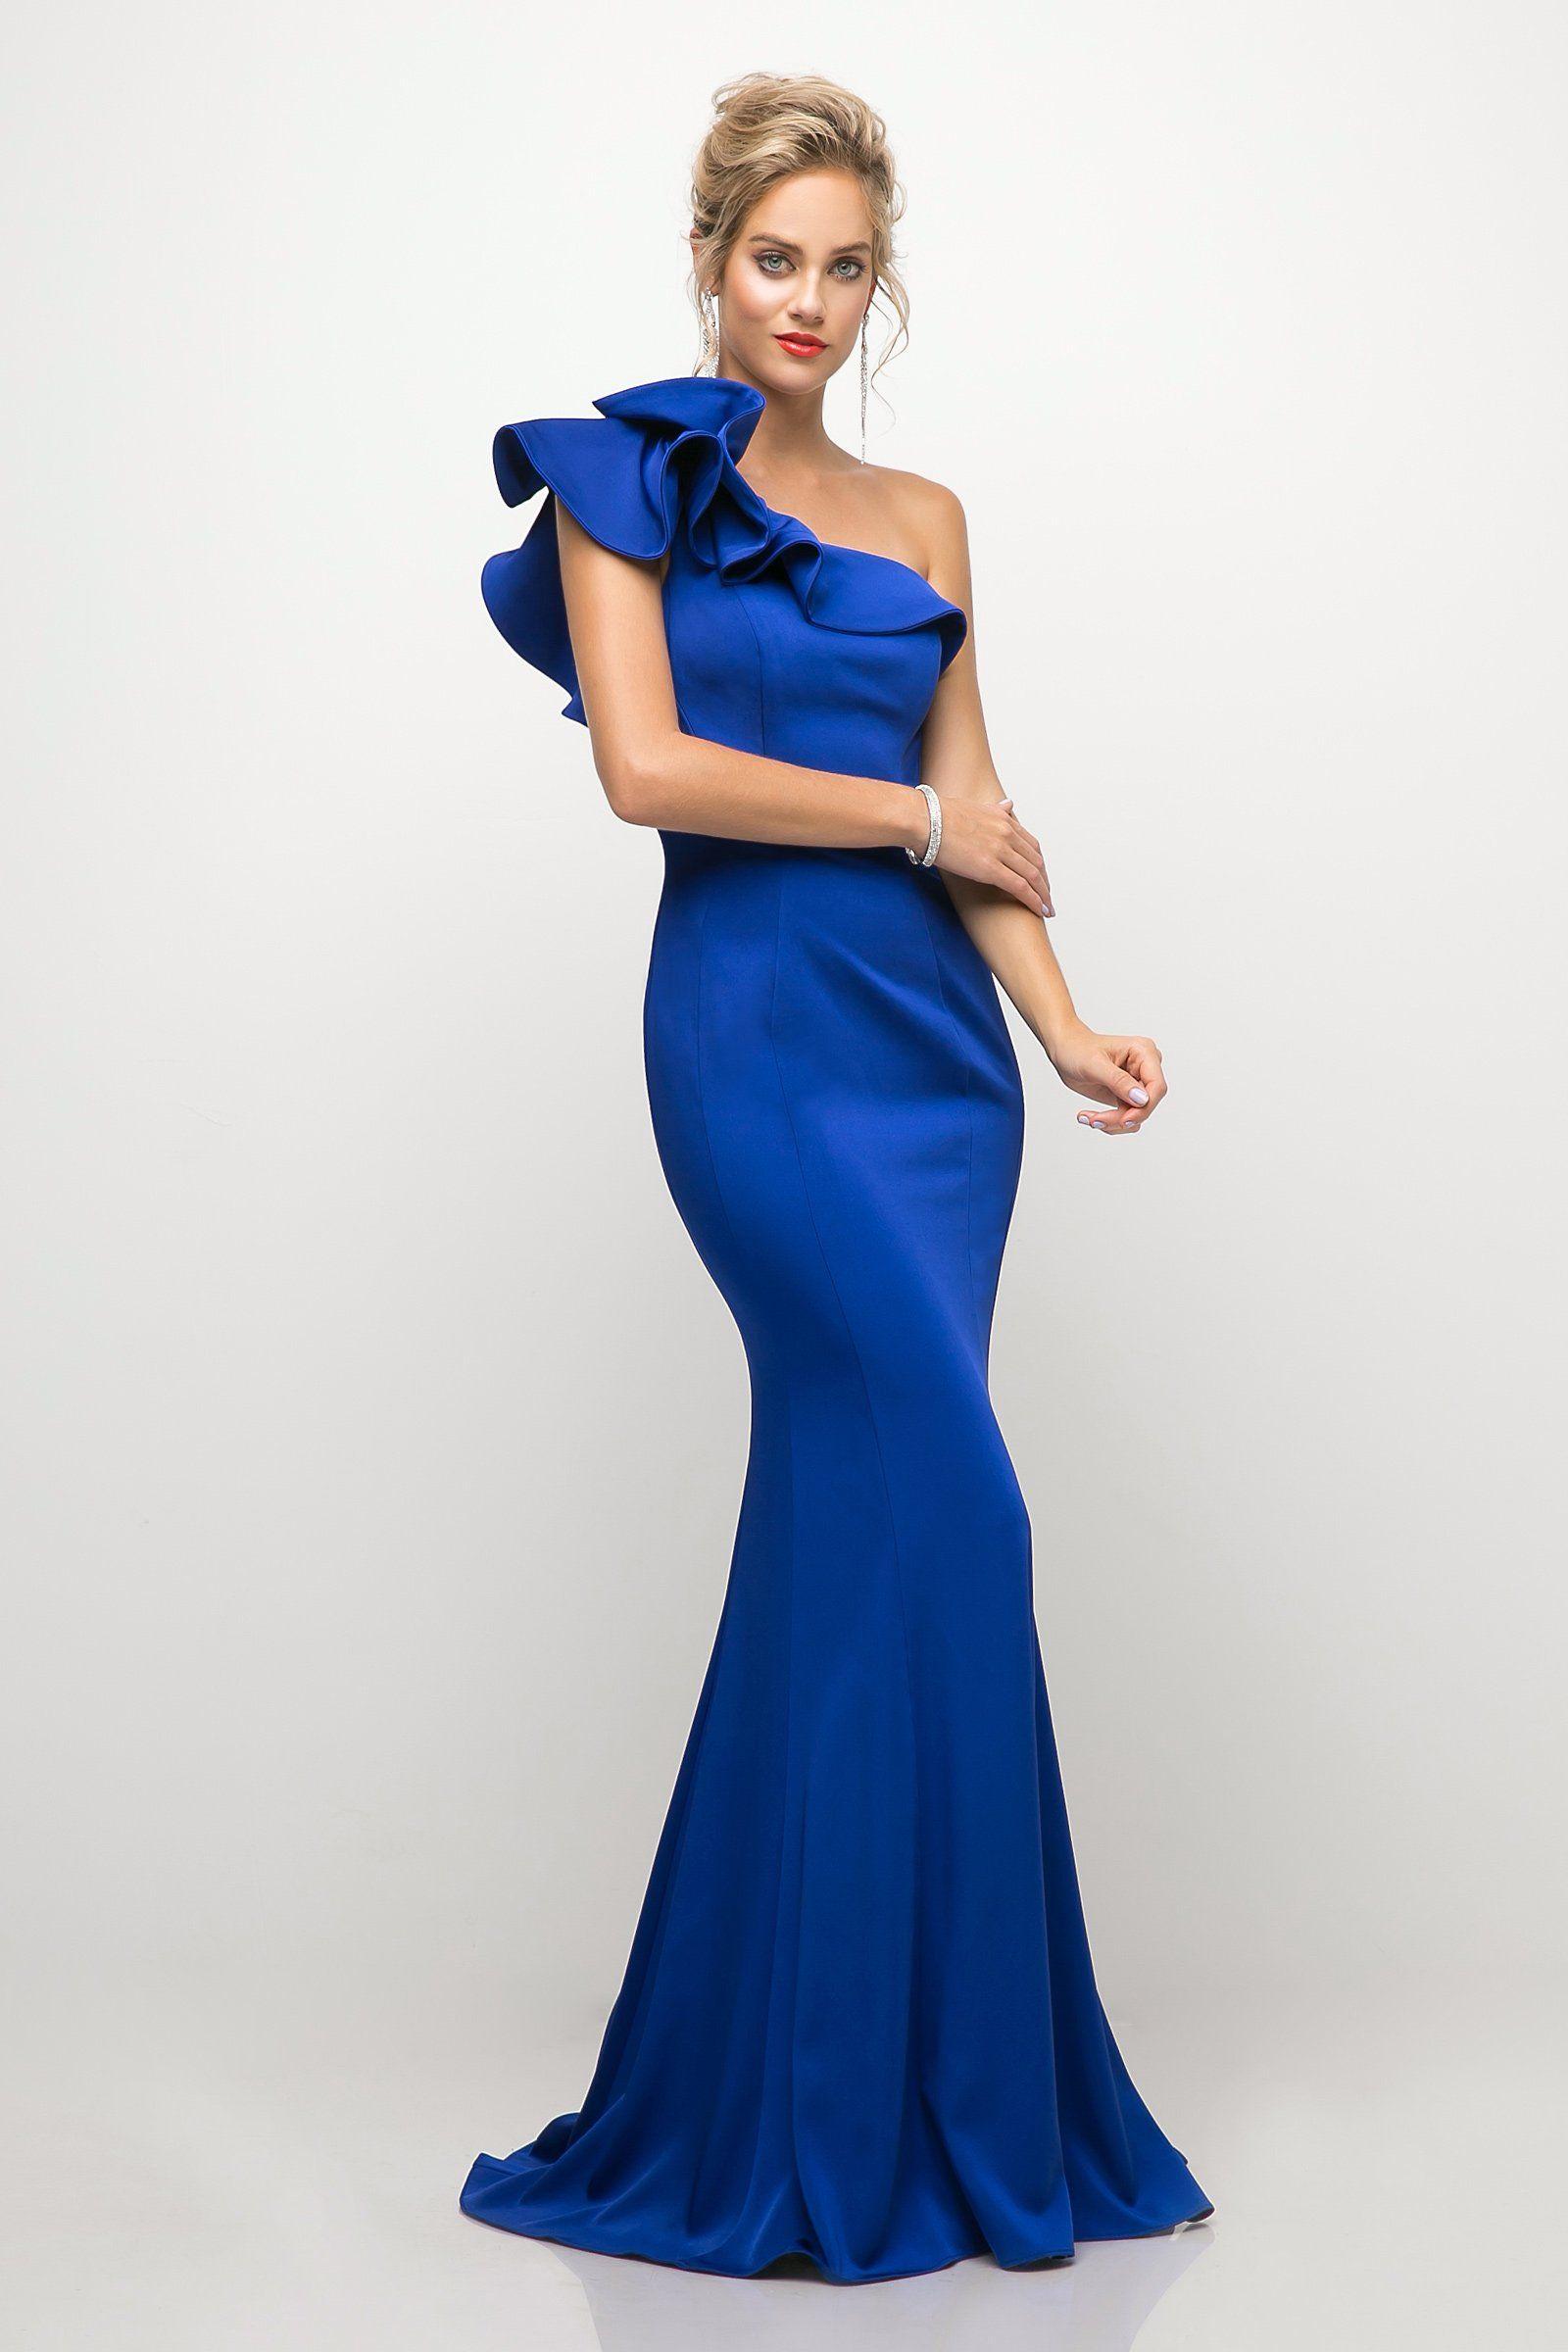 8714212edd2e19 Ruffled Asymmetric One Shoulder Gown by Cinderella Divine ET325